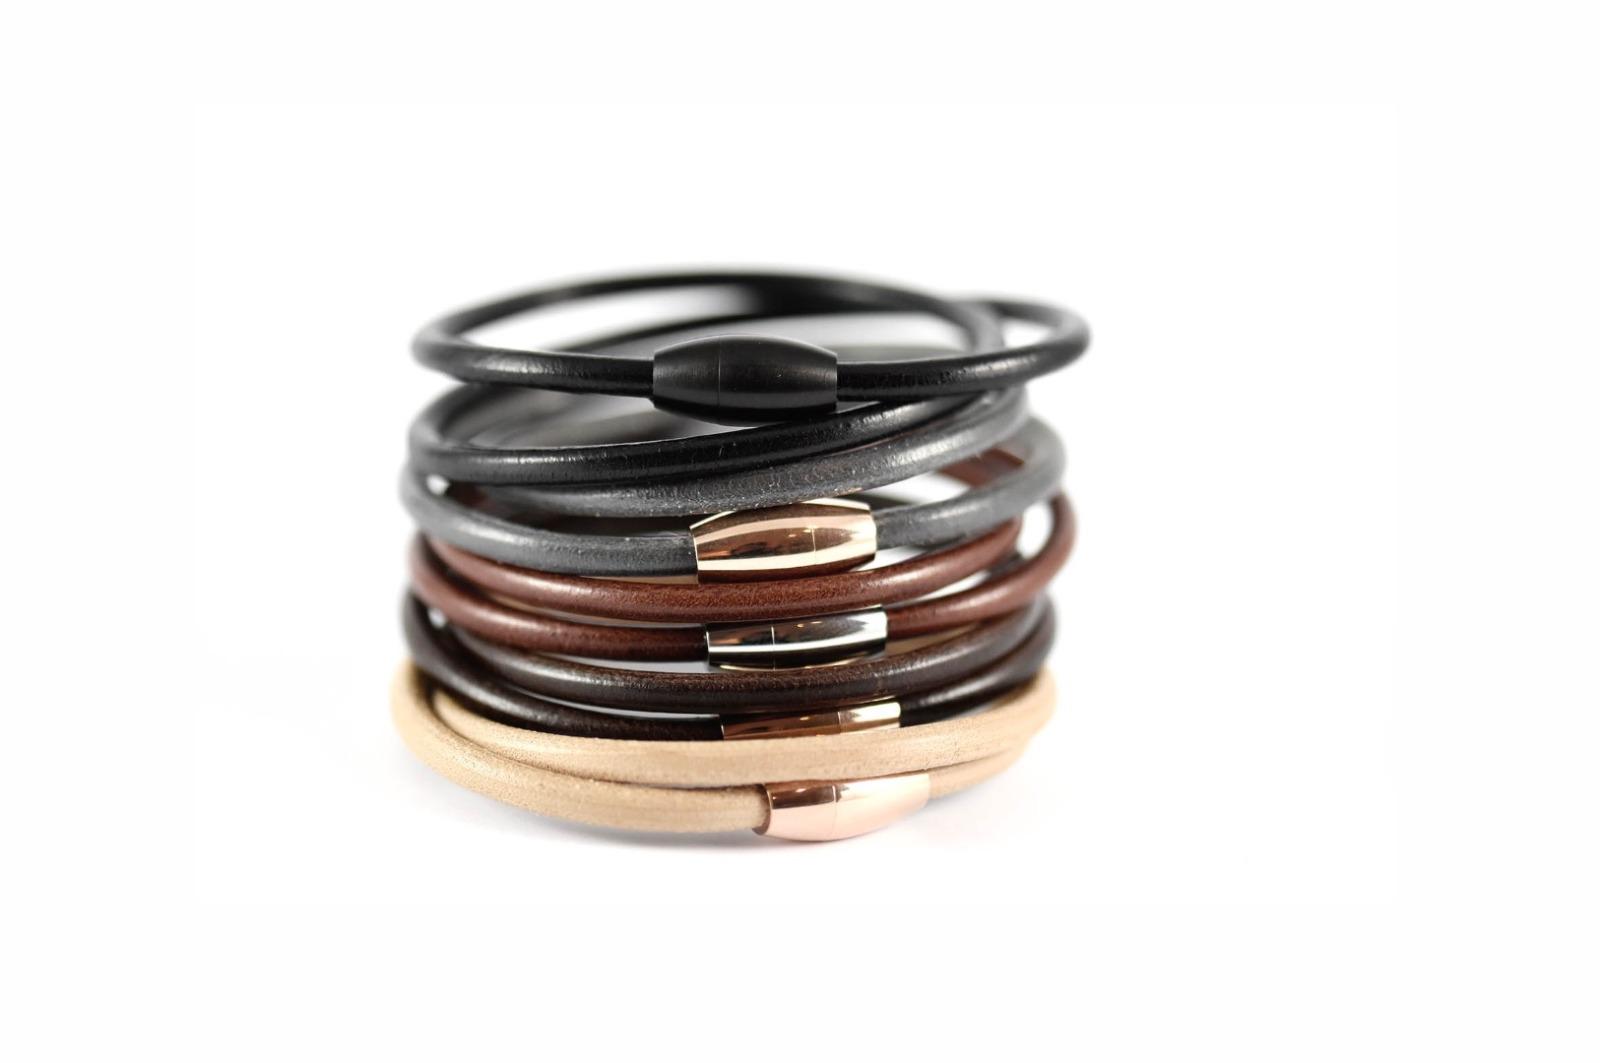 Wickelarmband Kernleder, Magnetverschluss - 4